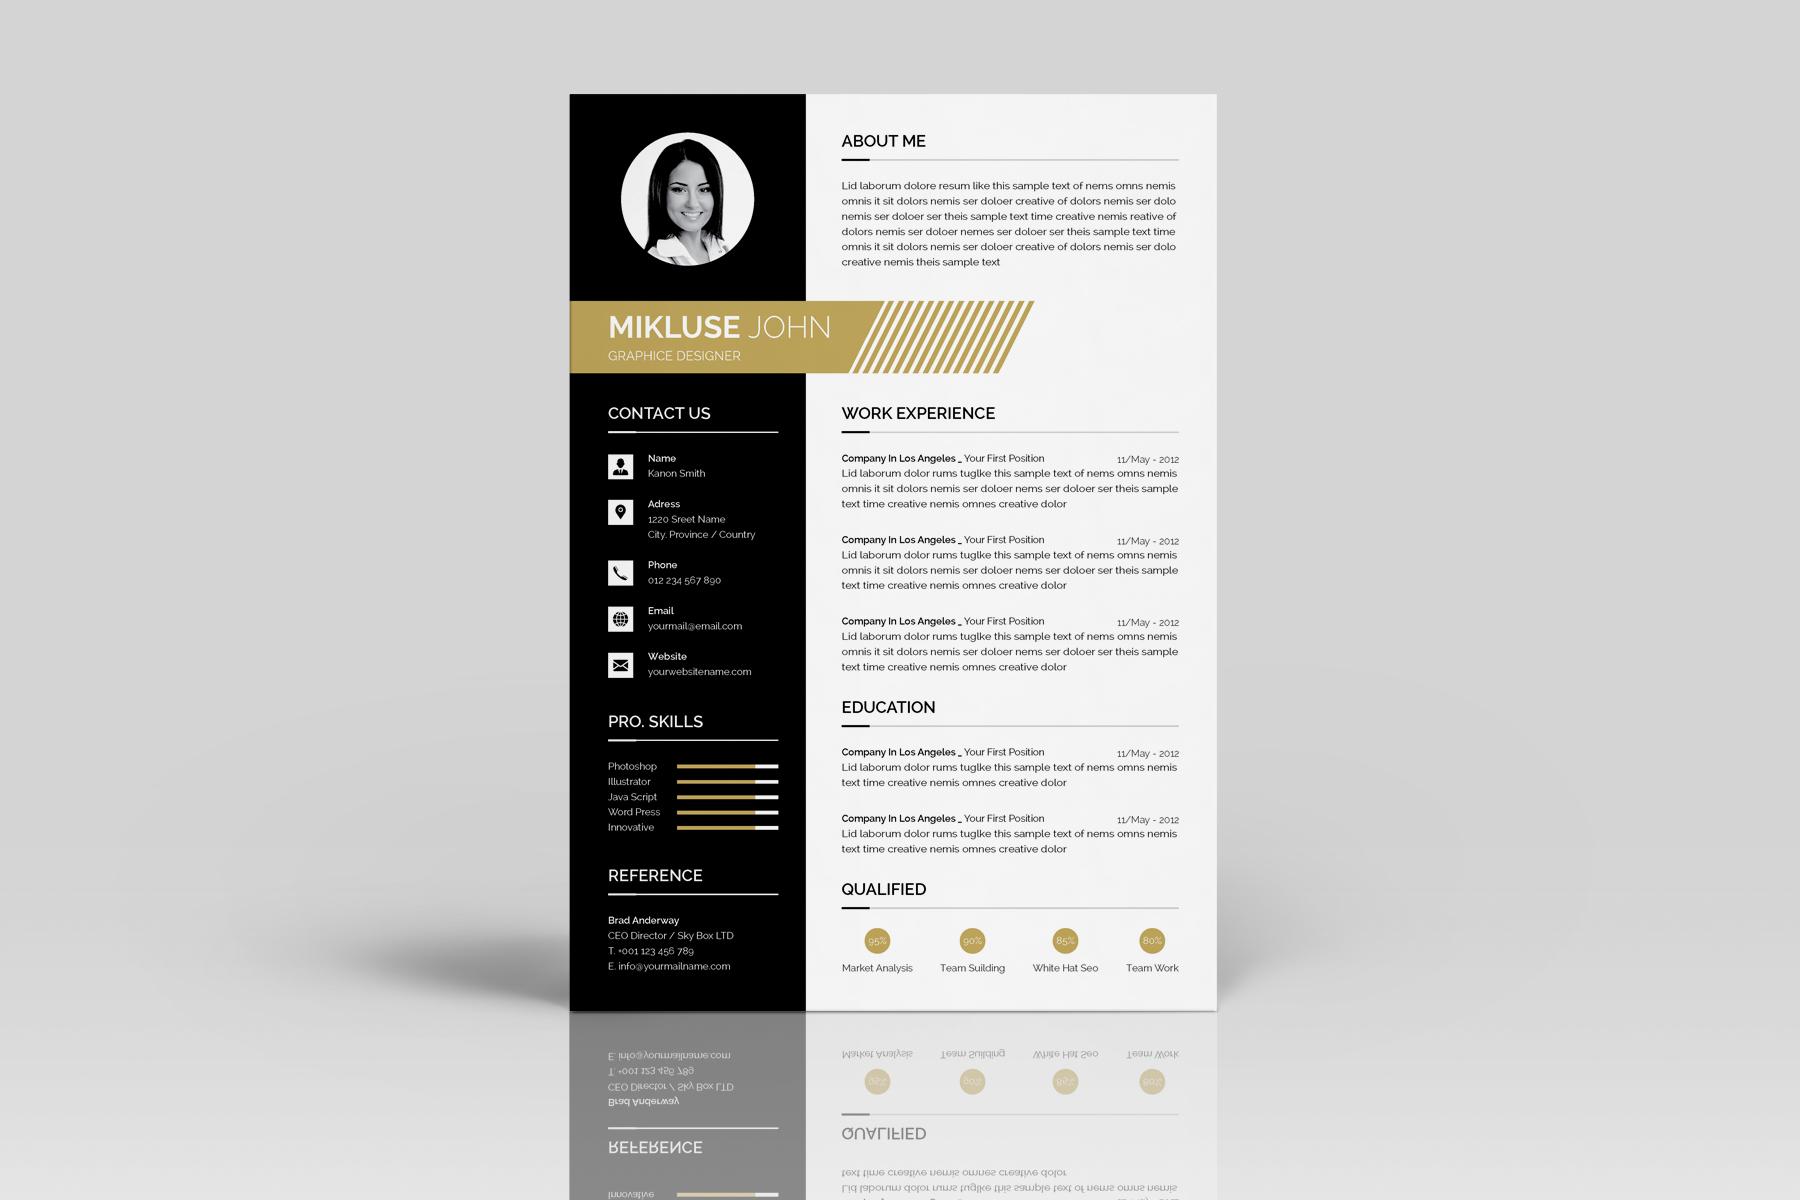 mikluse john graphice designer resume template  73475